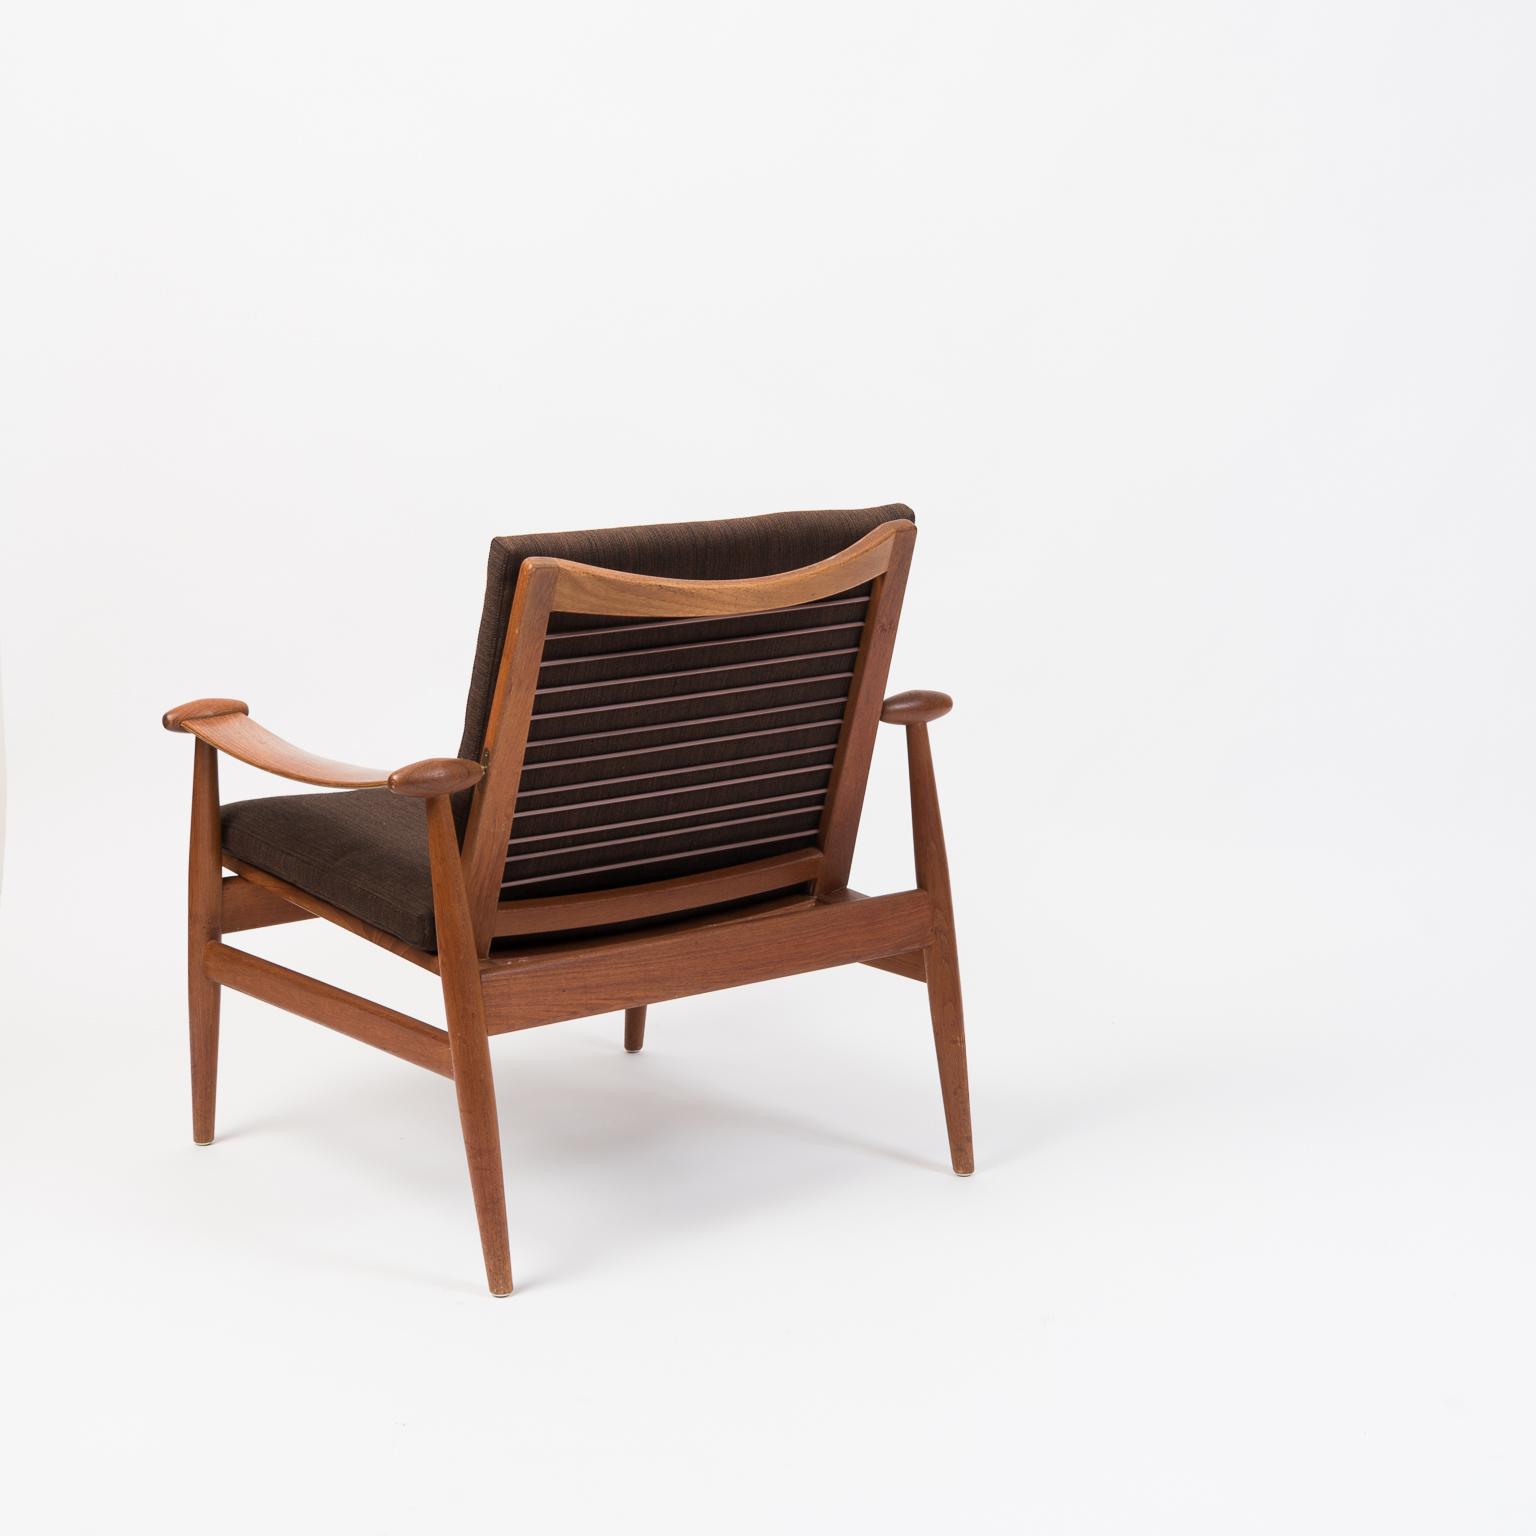 20th Century Spade Chair by Finn Juhl